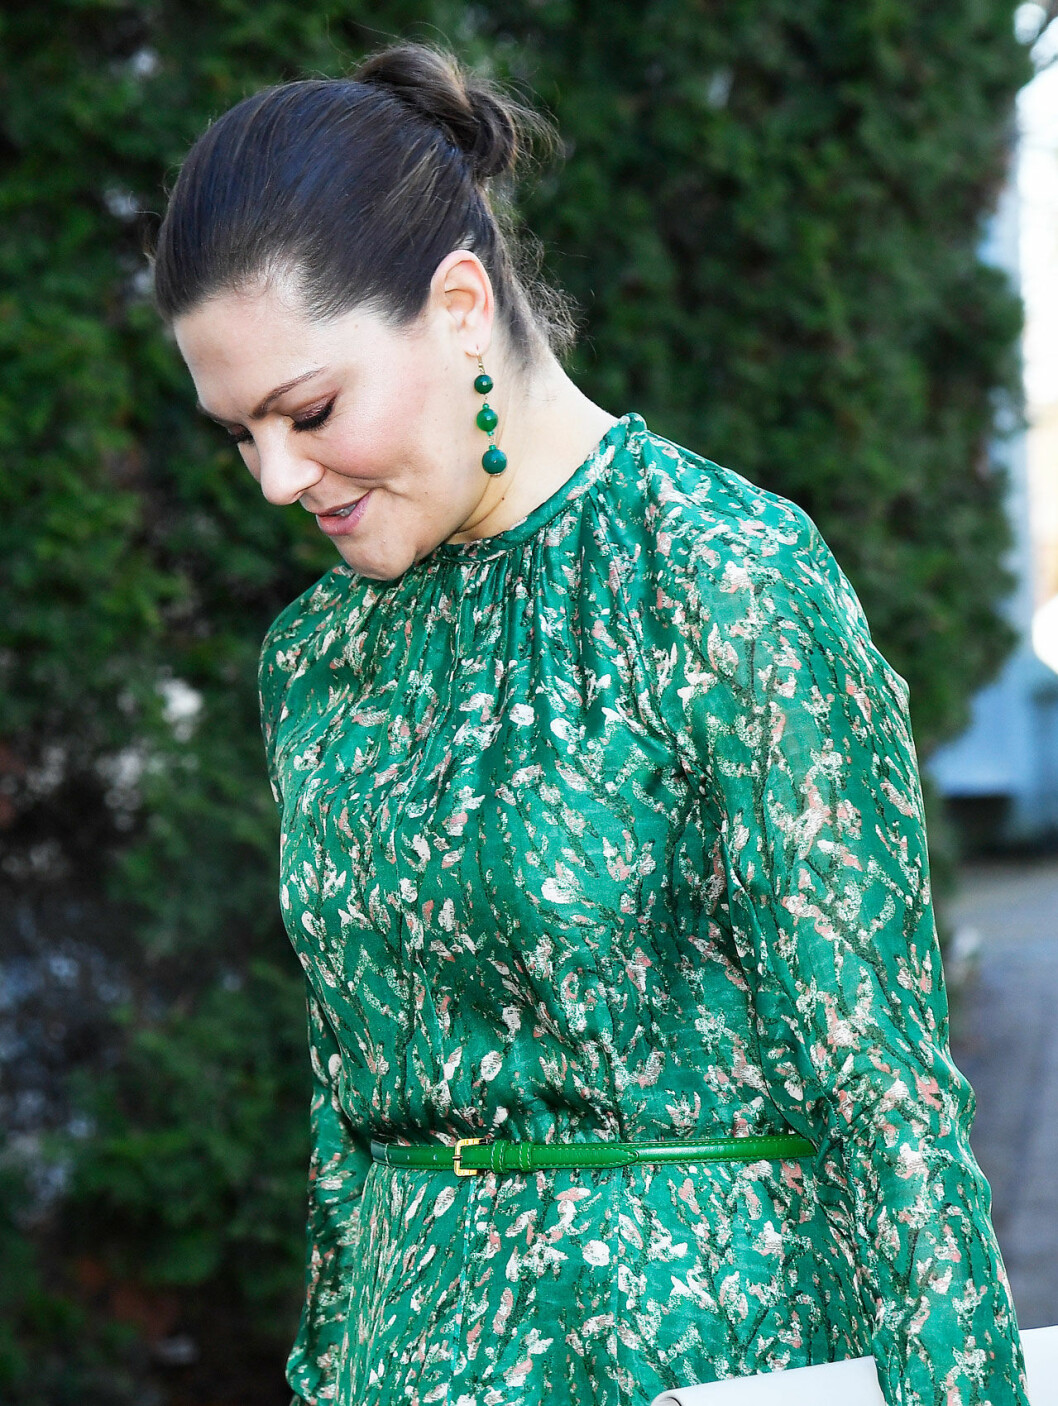 Kronprinsessan Victoria i grönt.